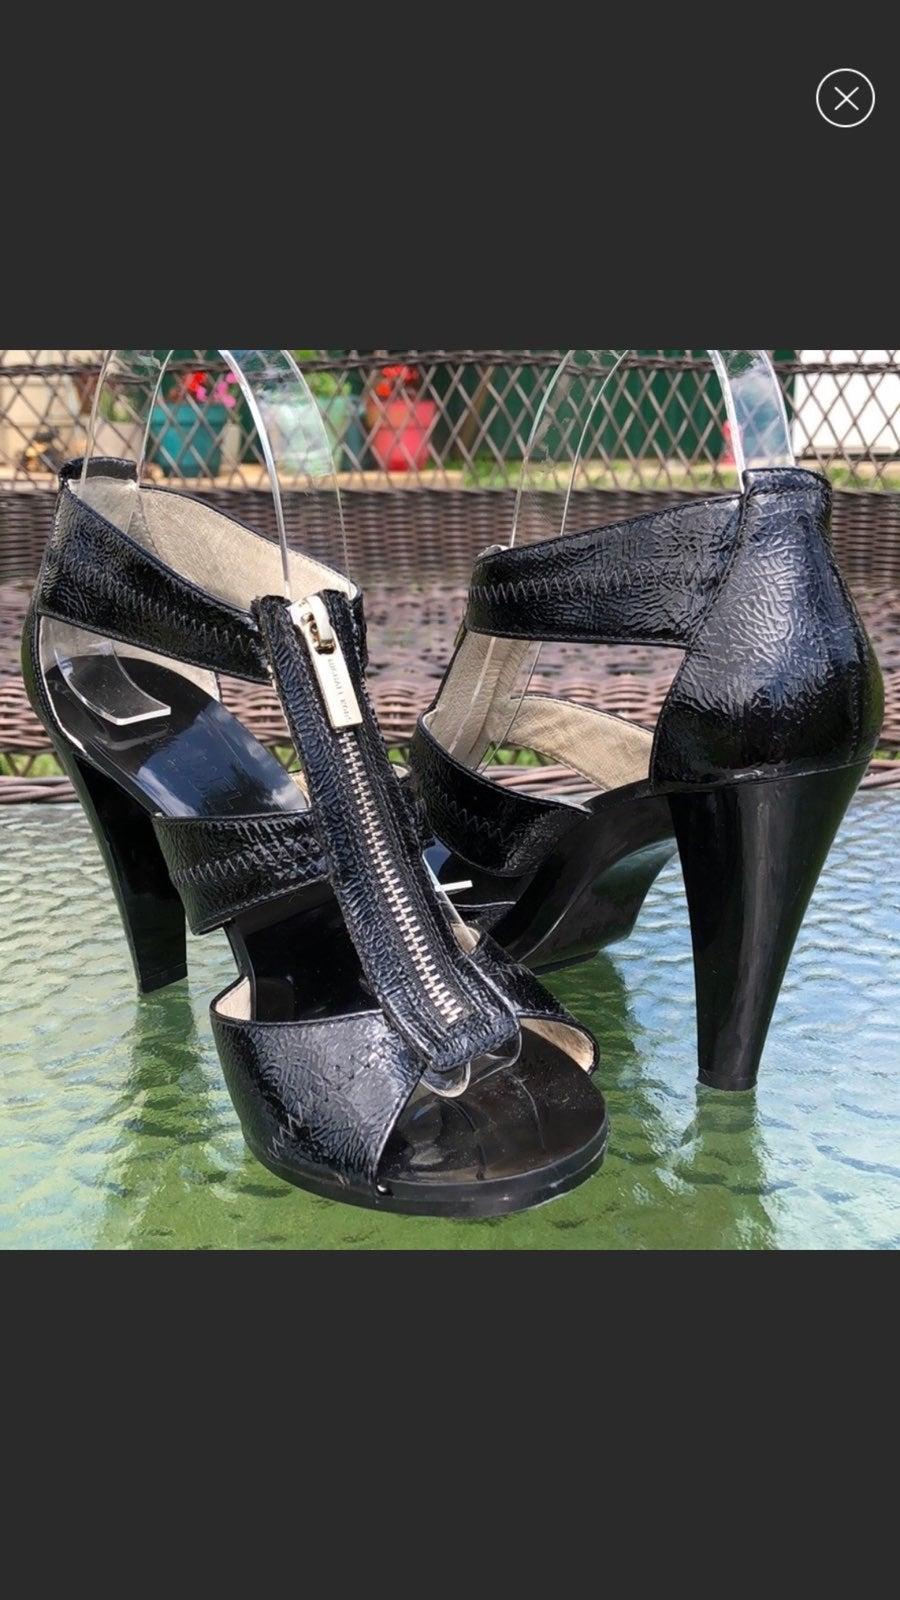 Micheal Kors black patent leather pumps